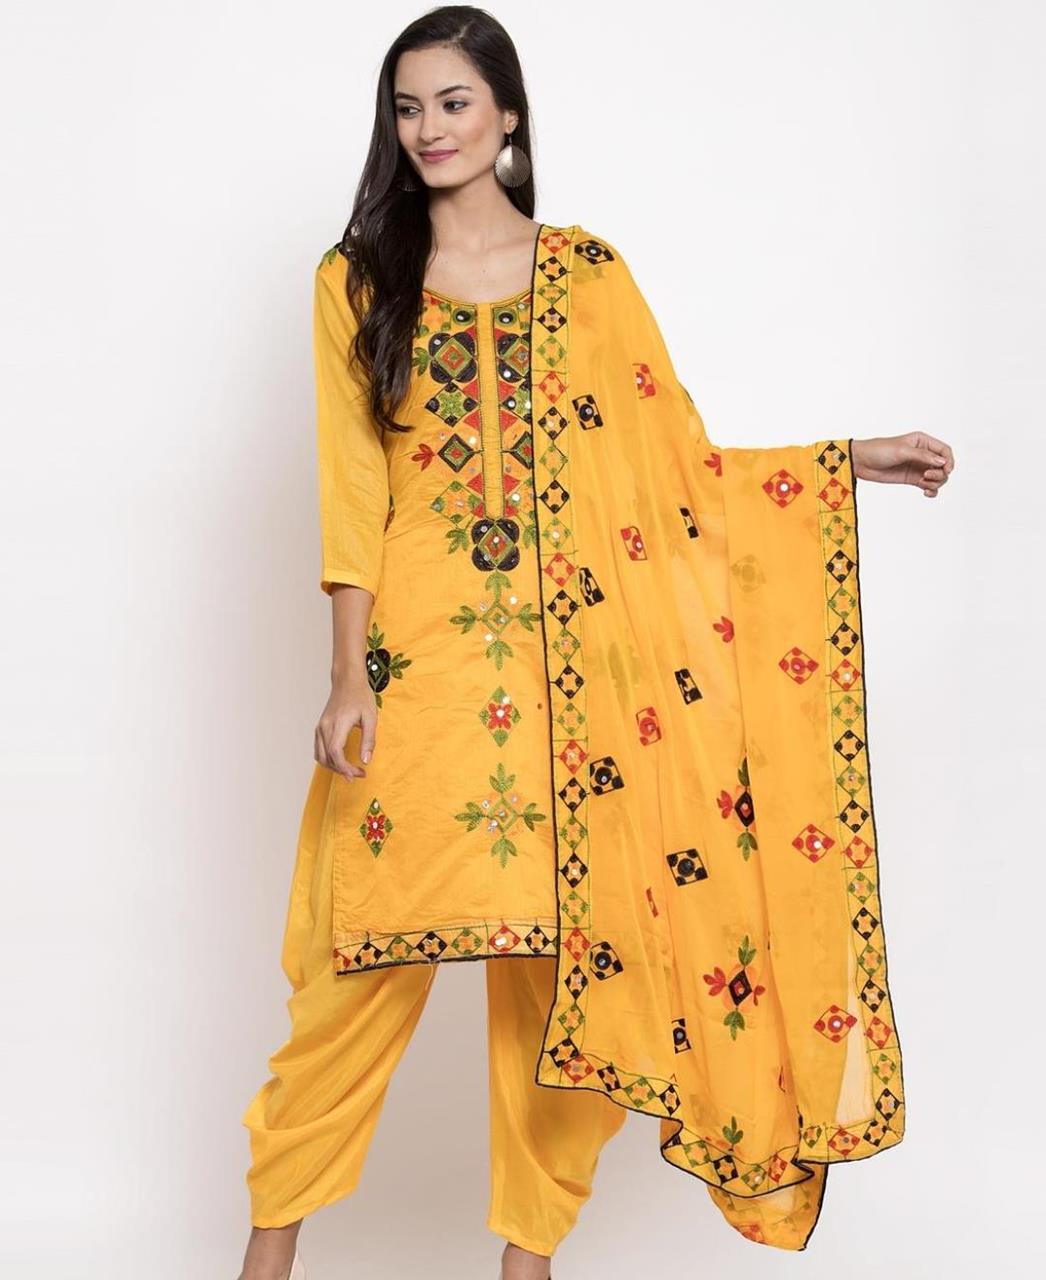 HandWorked Silk Patiyala Suit Salwar in Yellow